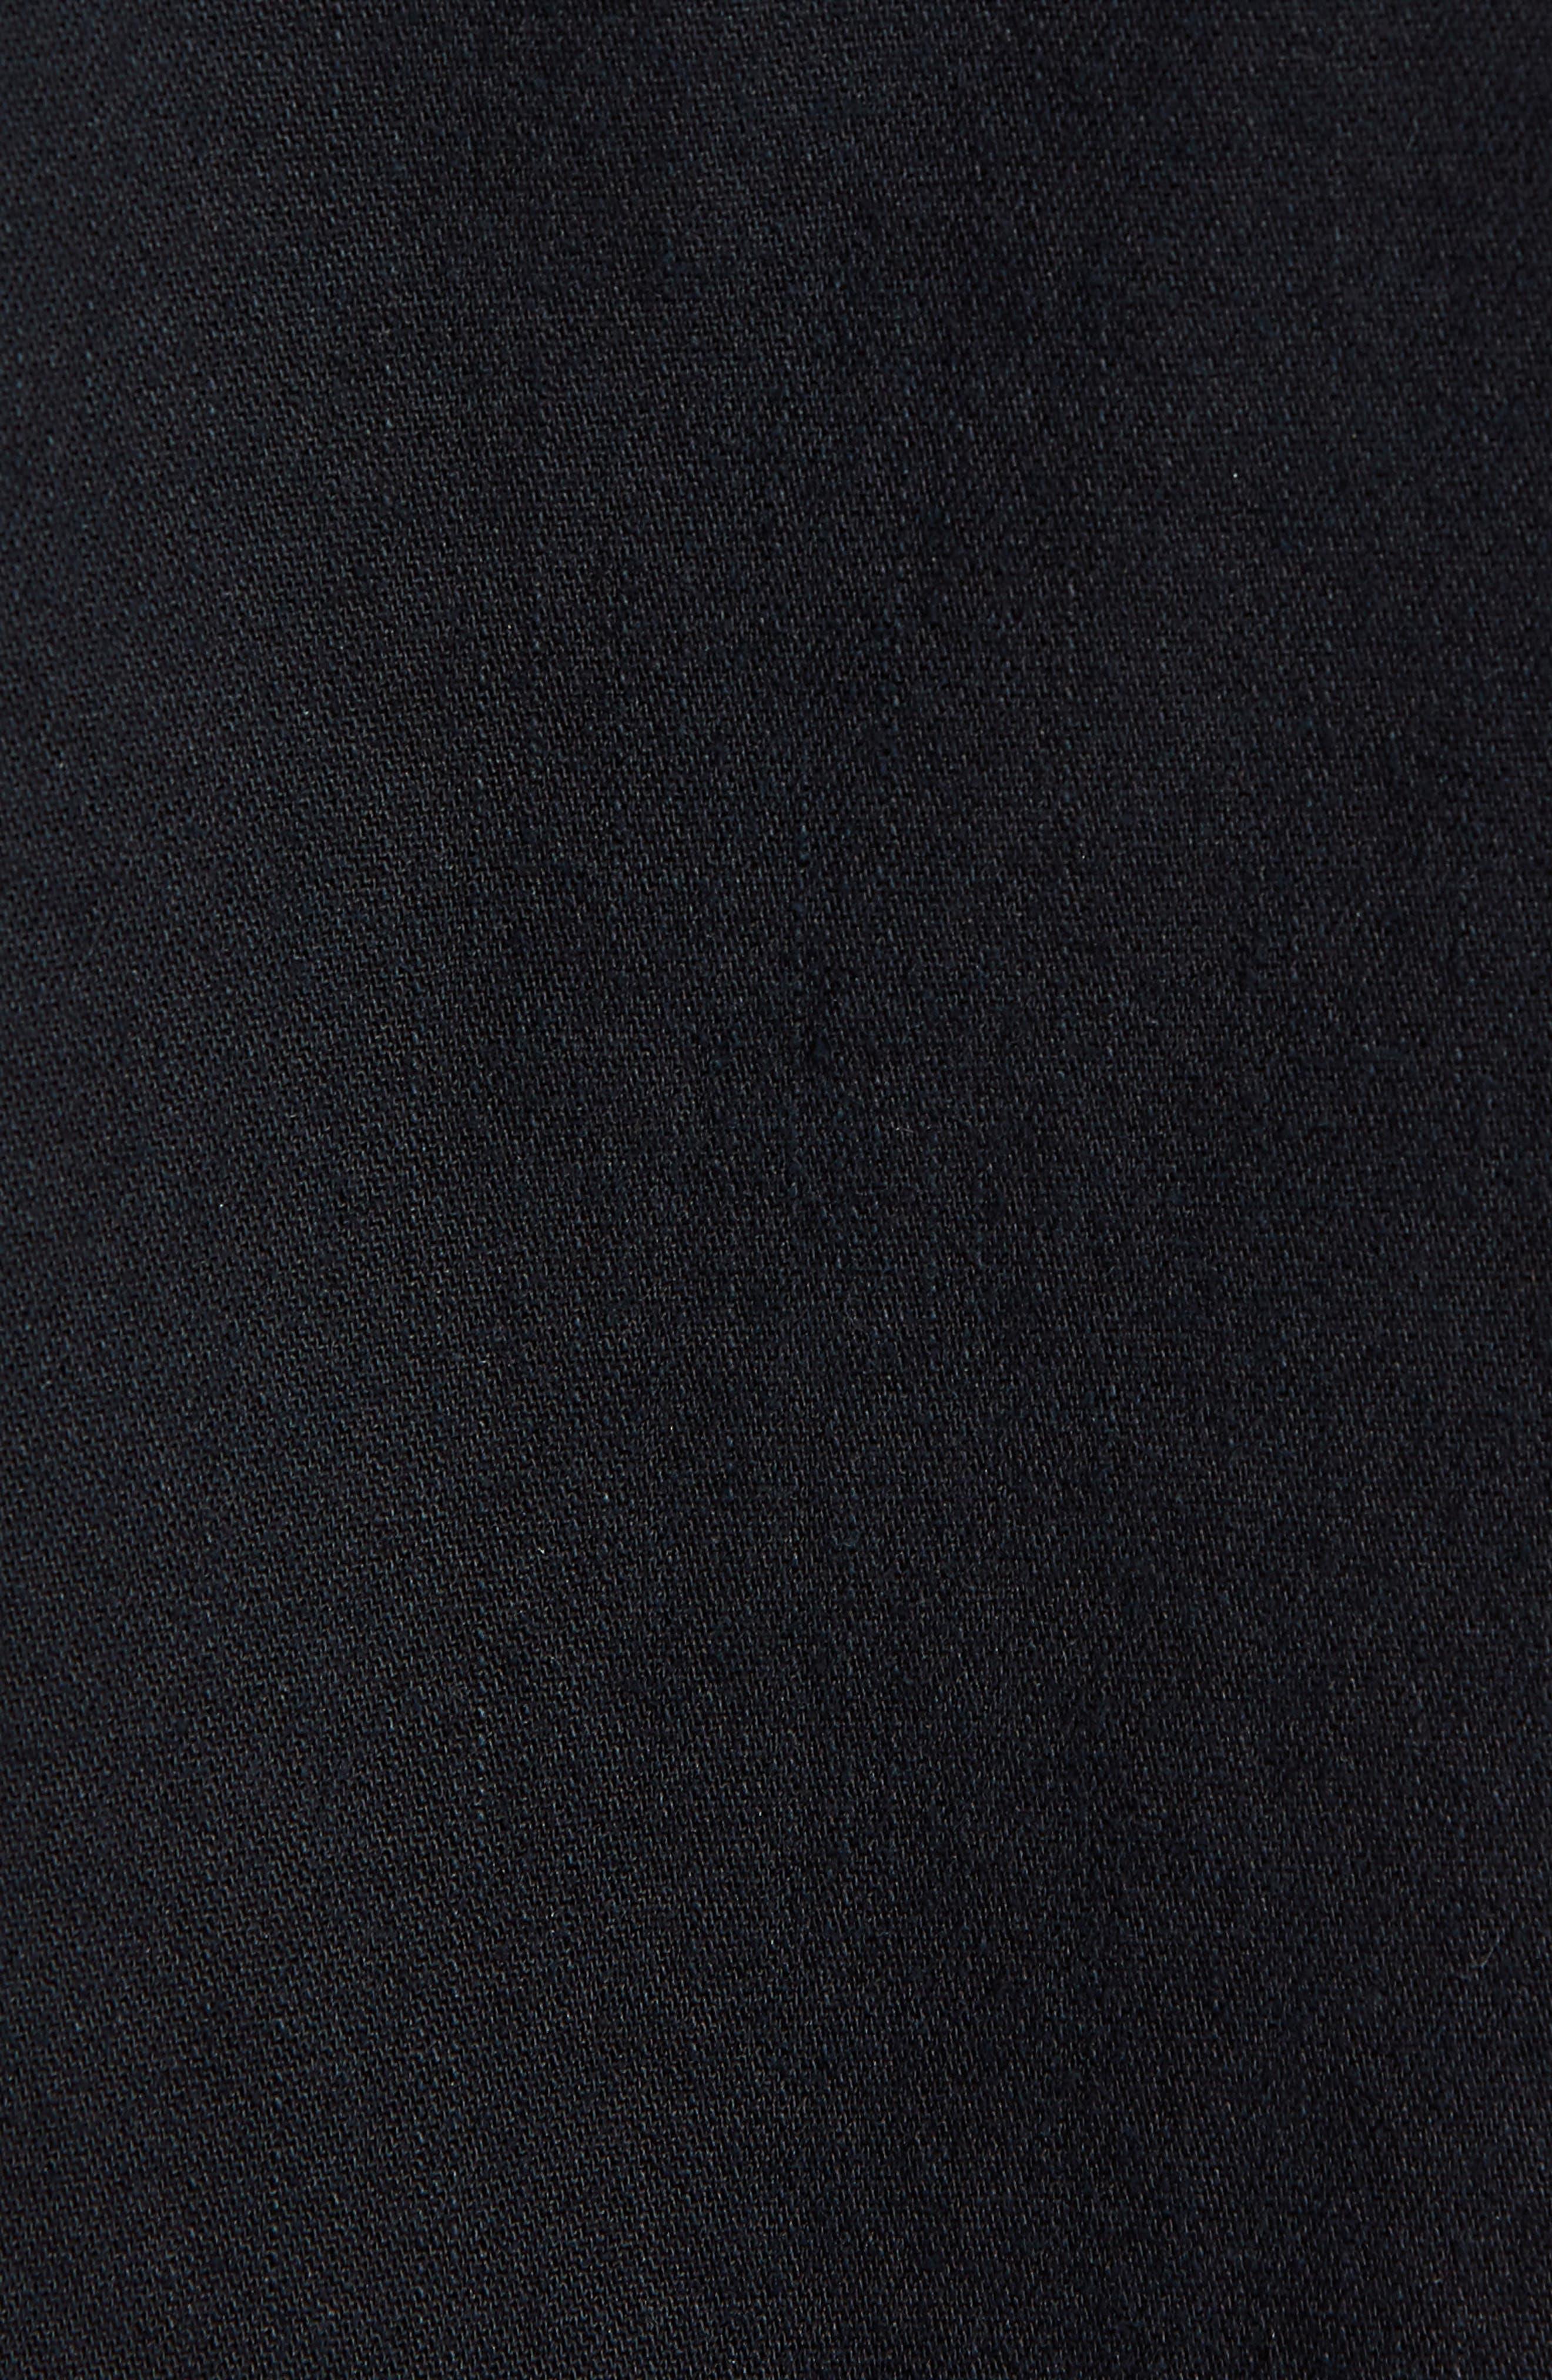 TREASURE & BOND,                             Western Denim Sport Shirt,                             Alternate thumbnail 5, color,                             002